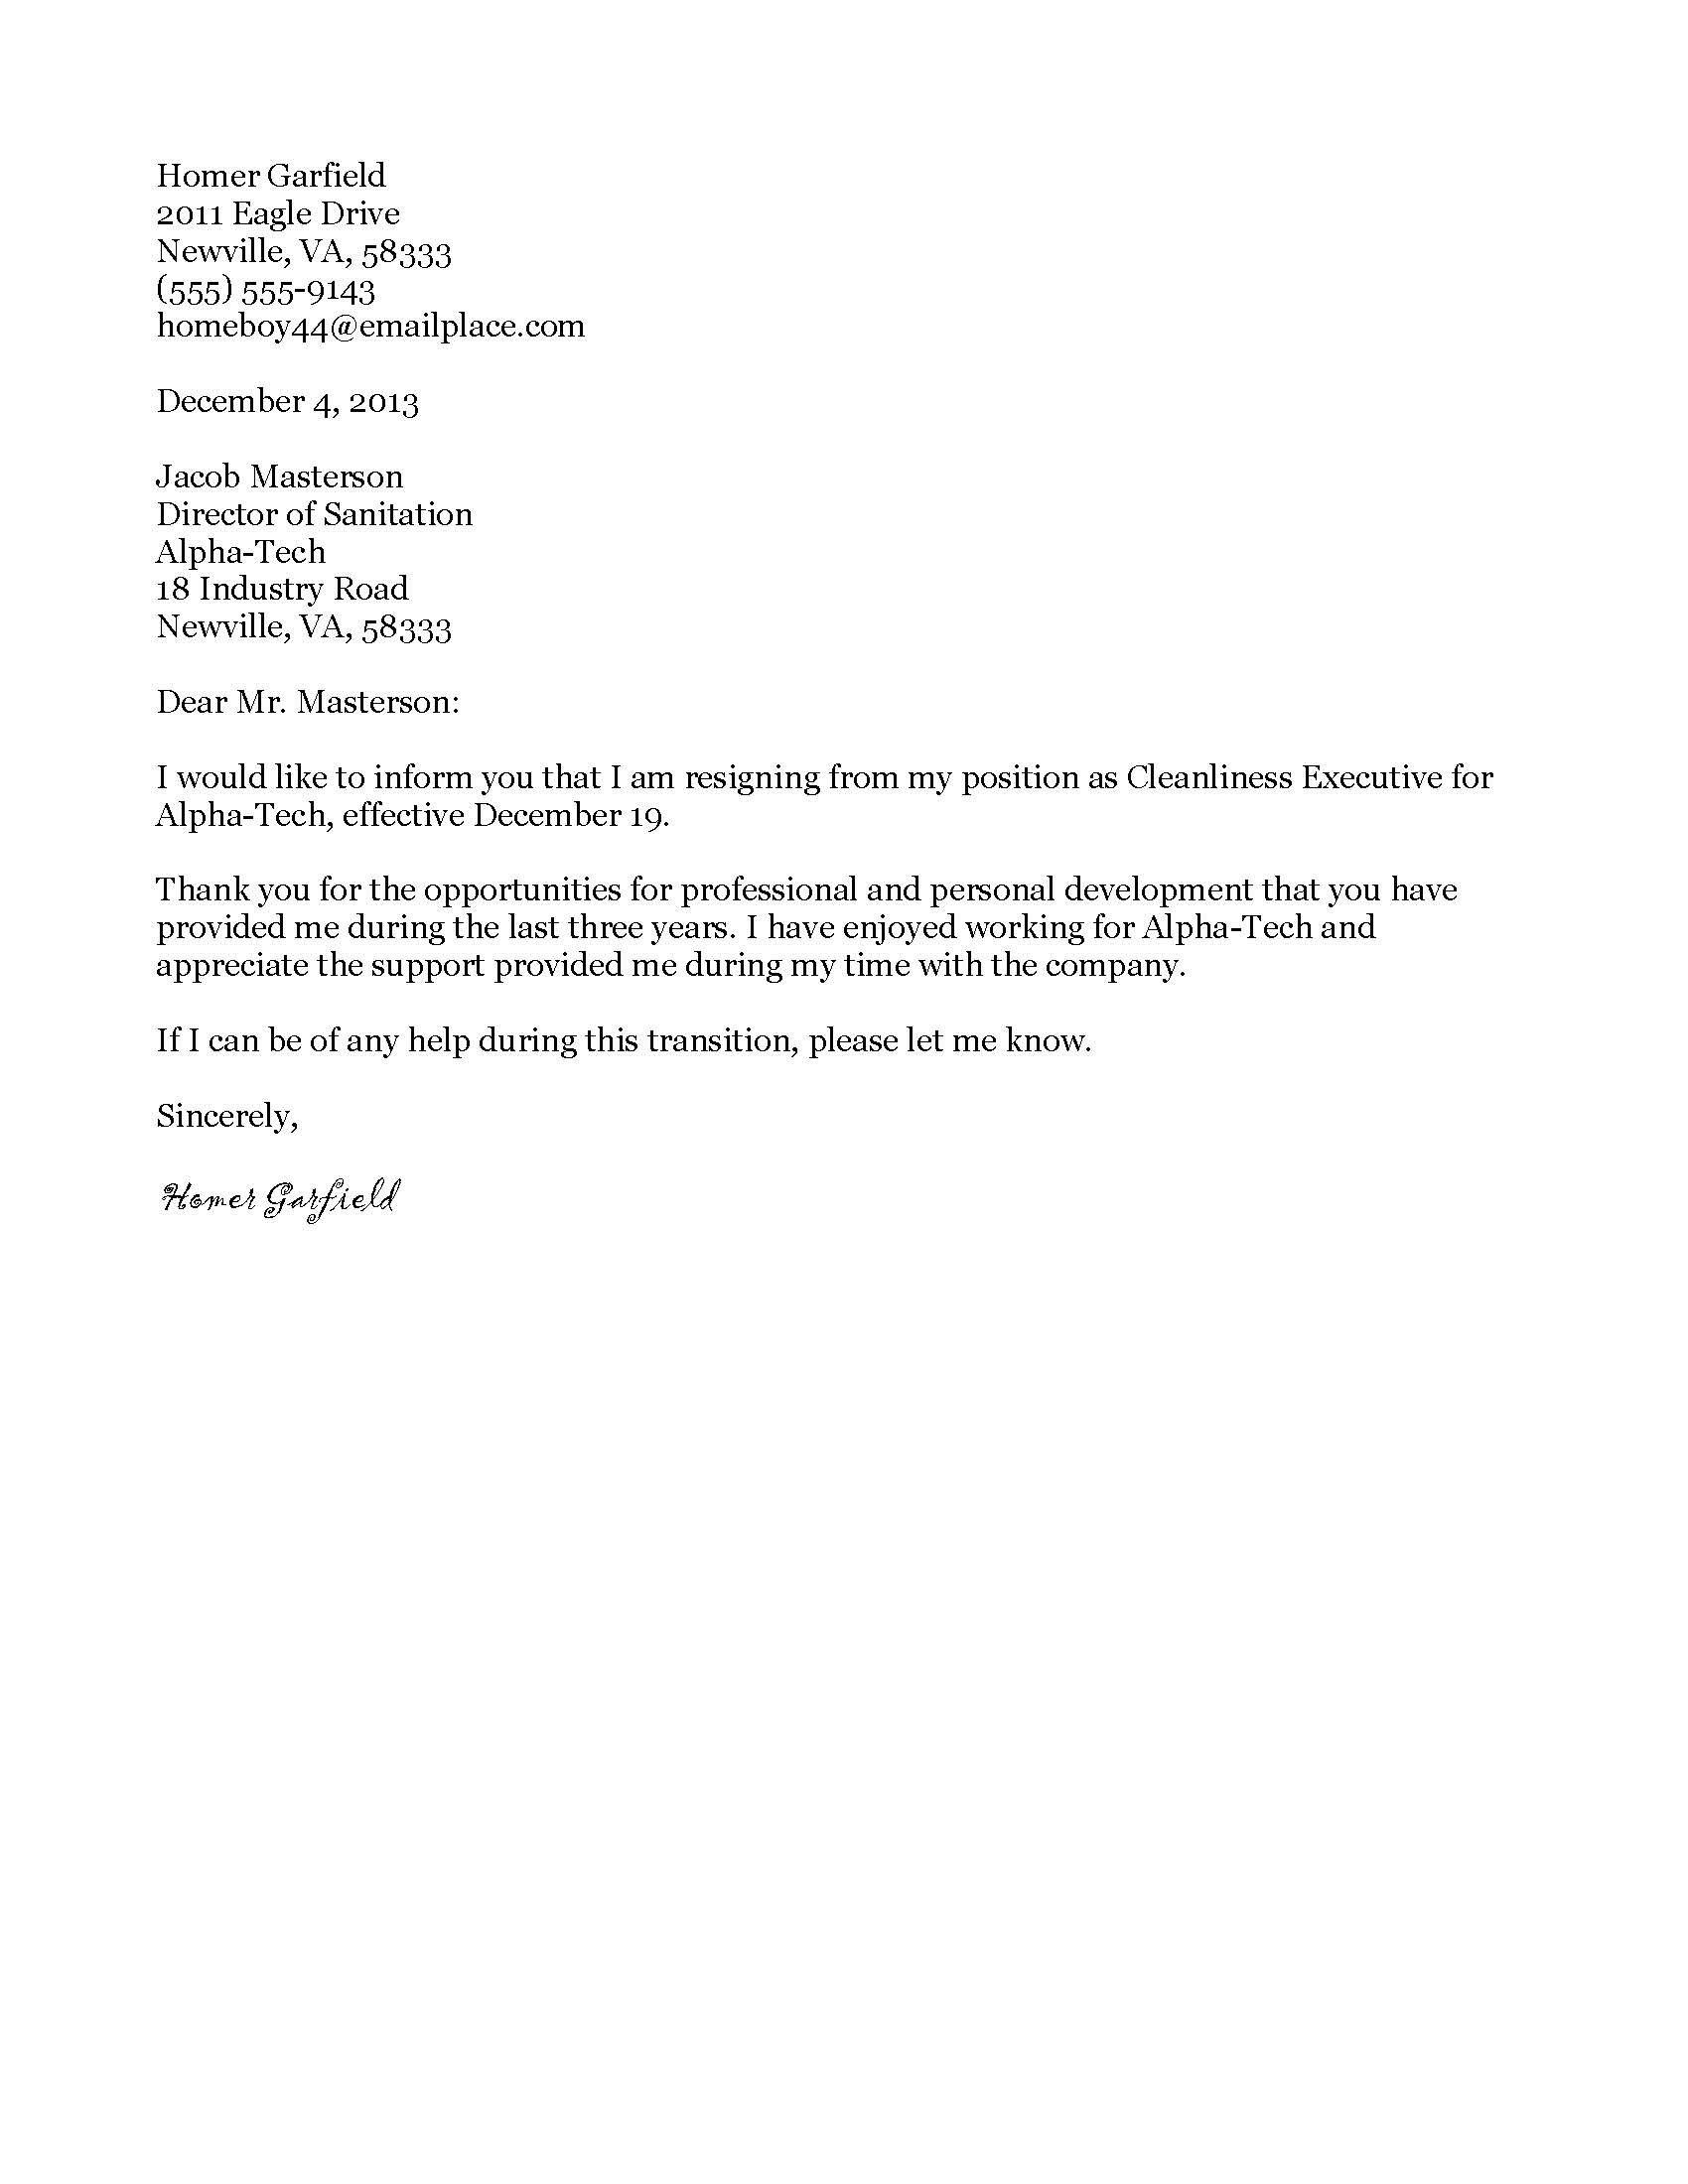 basic letters of resignation google search business pinterest letter of resignation